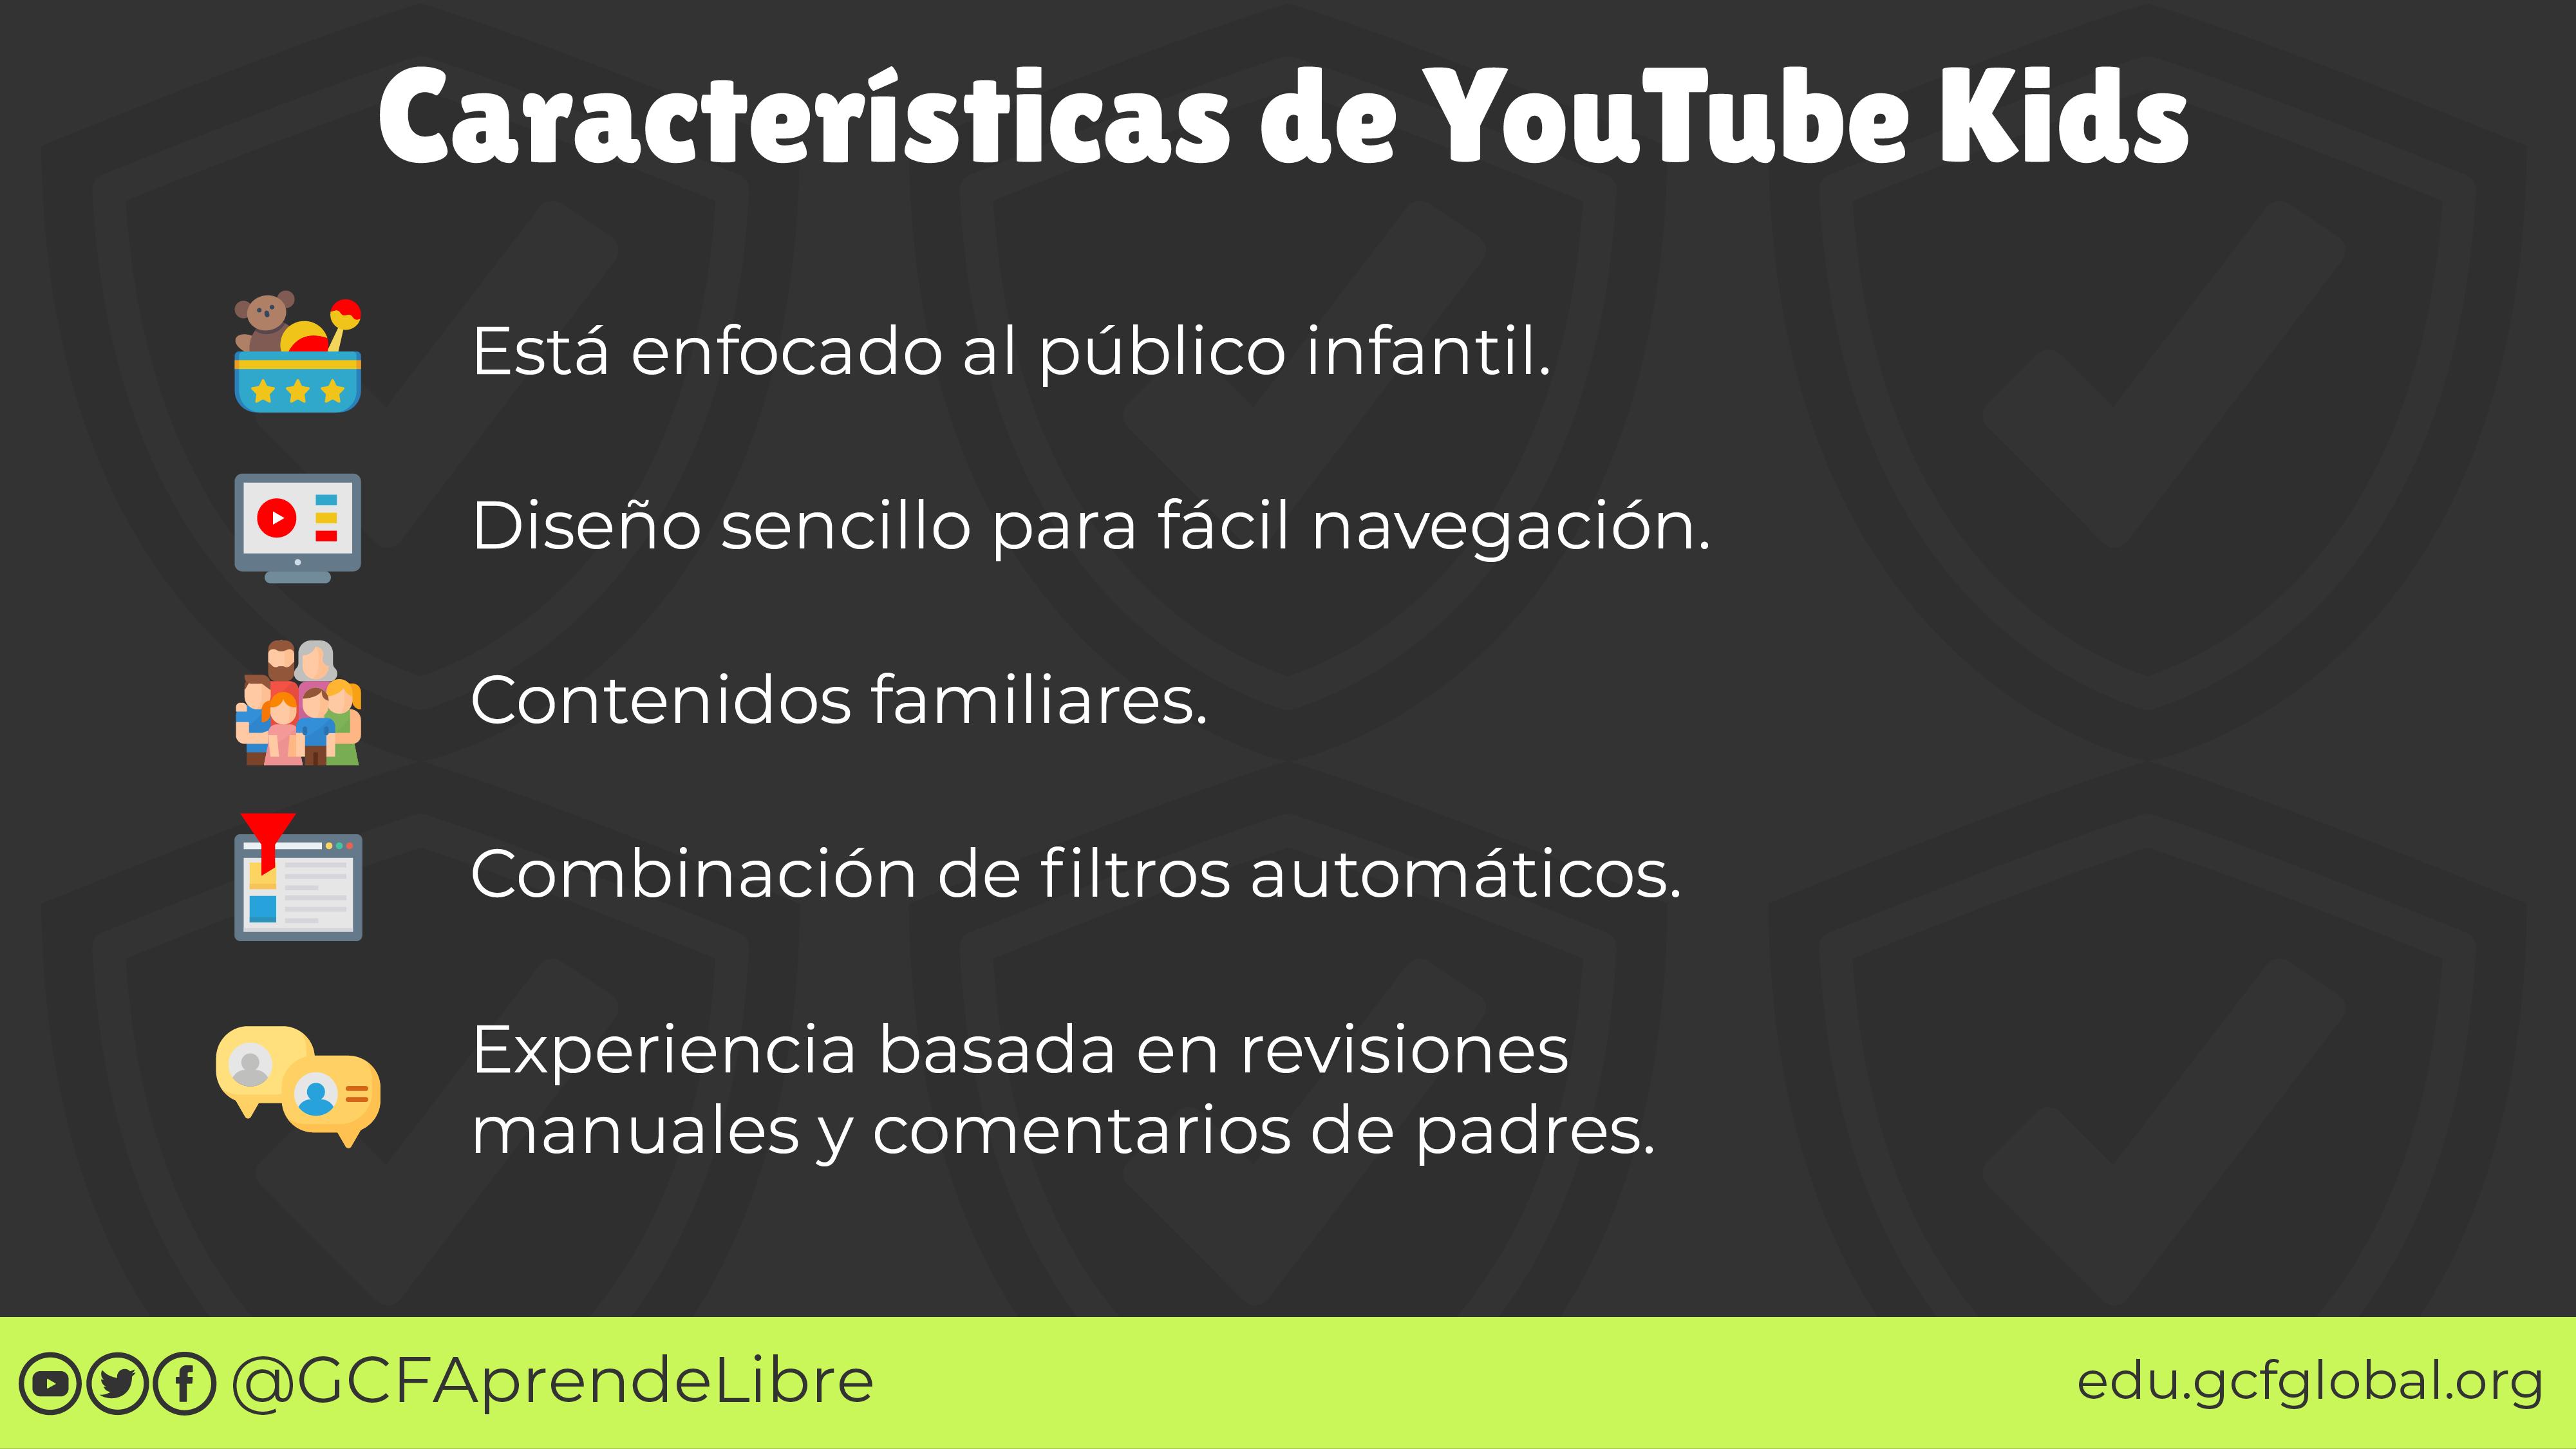 Características principales de YouTube Kids